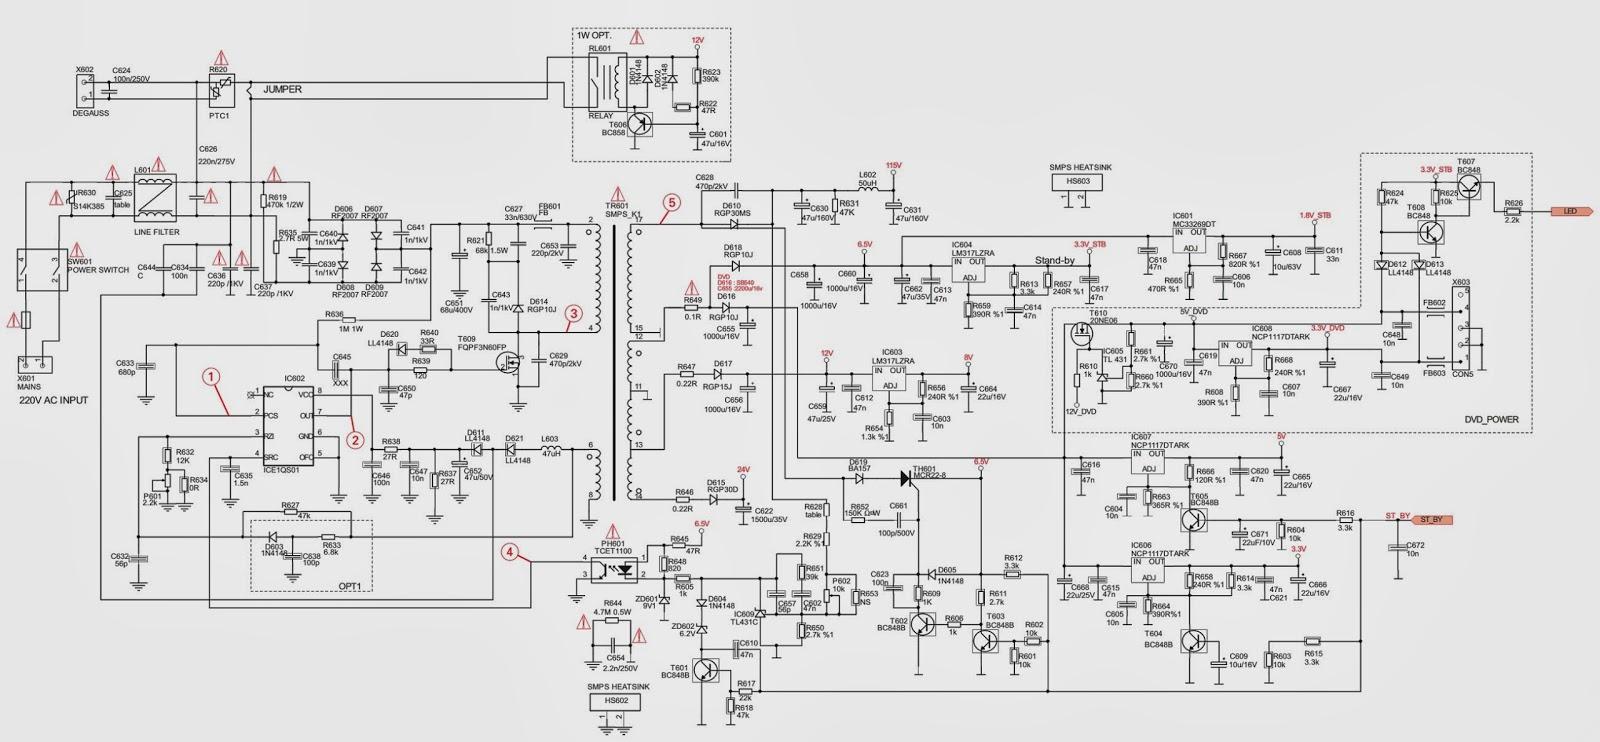 smps power supply circuit diagram electric mx tl 6000 power supply smps schematic circuit digram electro help [ 1600 x 742 Pixel ]